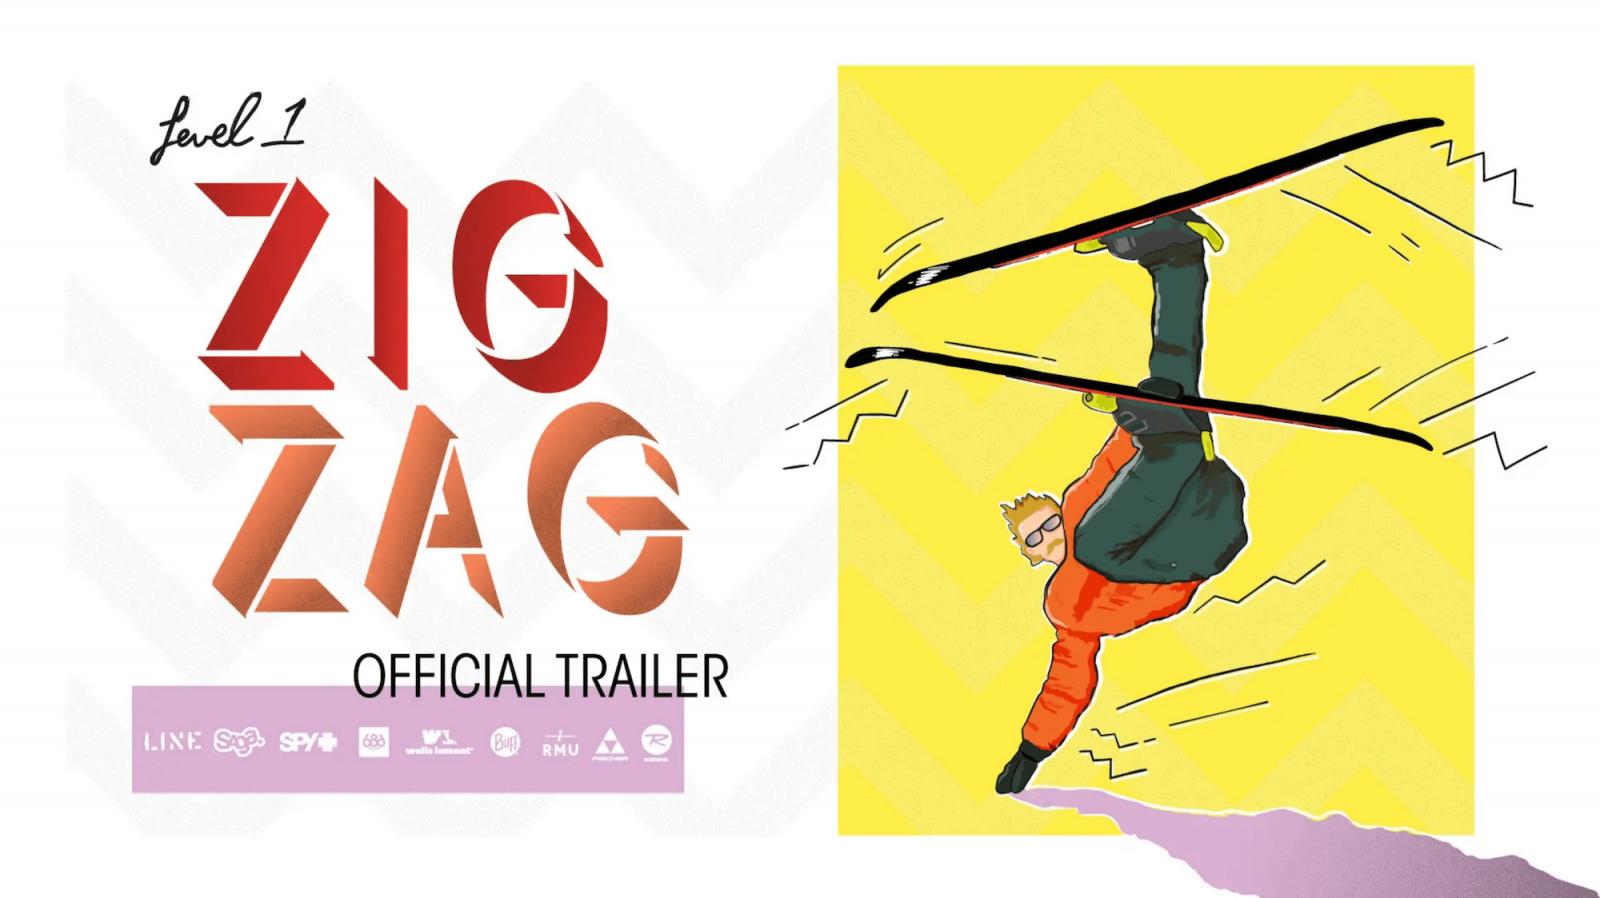 'Zig Zag' trailer is Live!